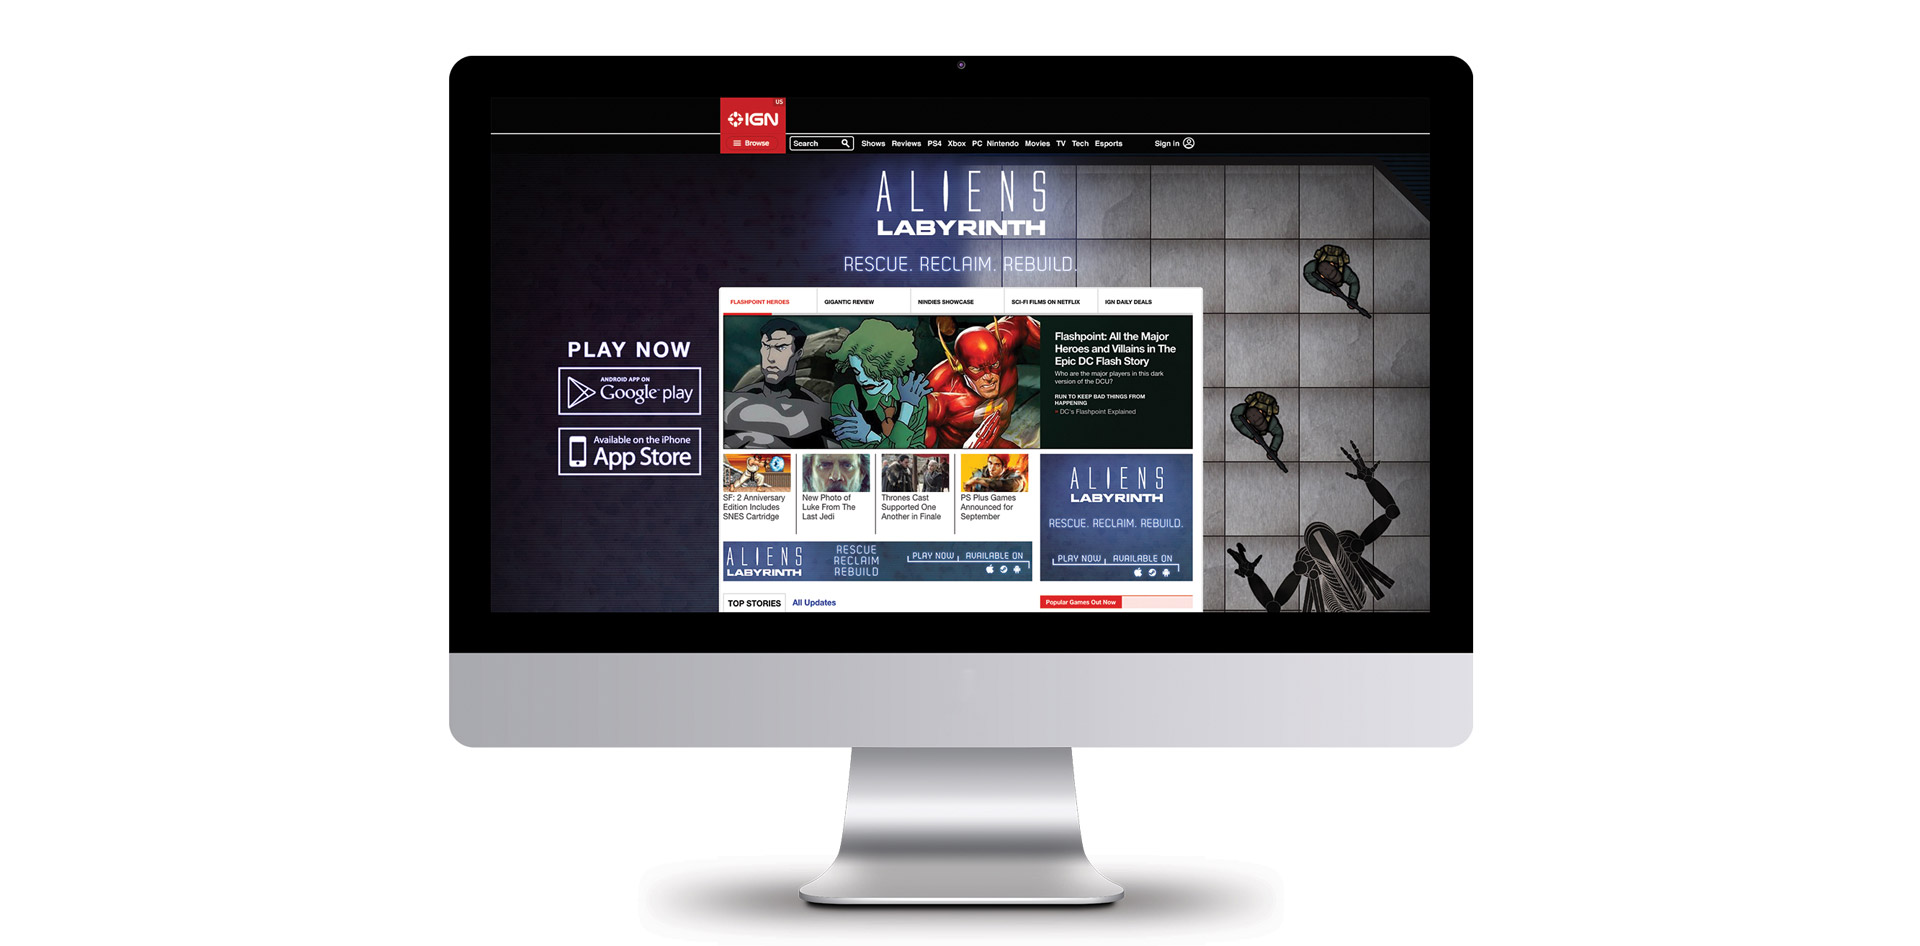 aliens-labyrinth-mobile-game-01.jpg